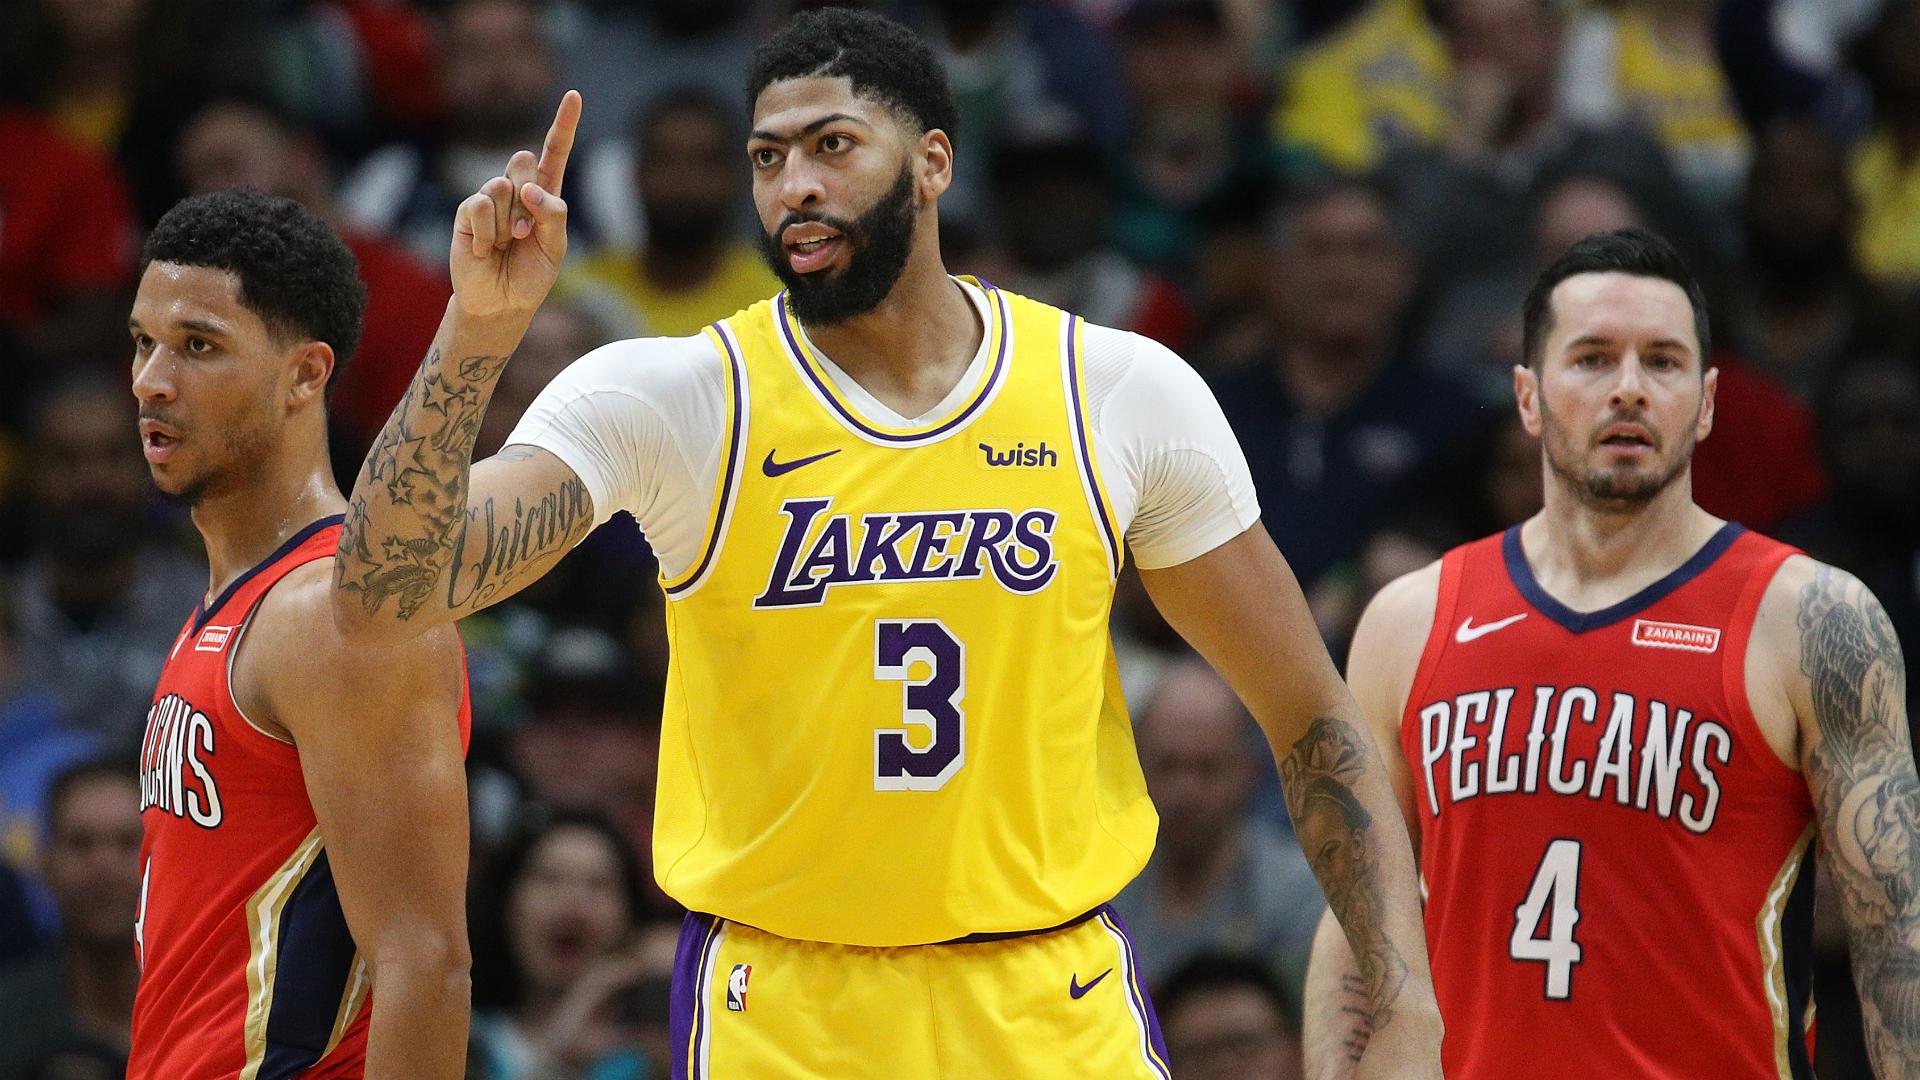 Davis enjoys winning return to New Orleans as Lakers stay hot, Walker scores 39